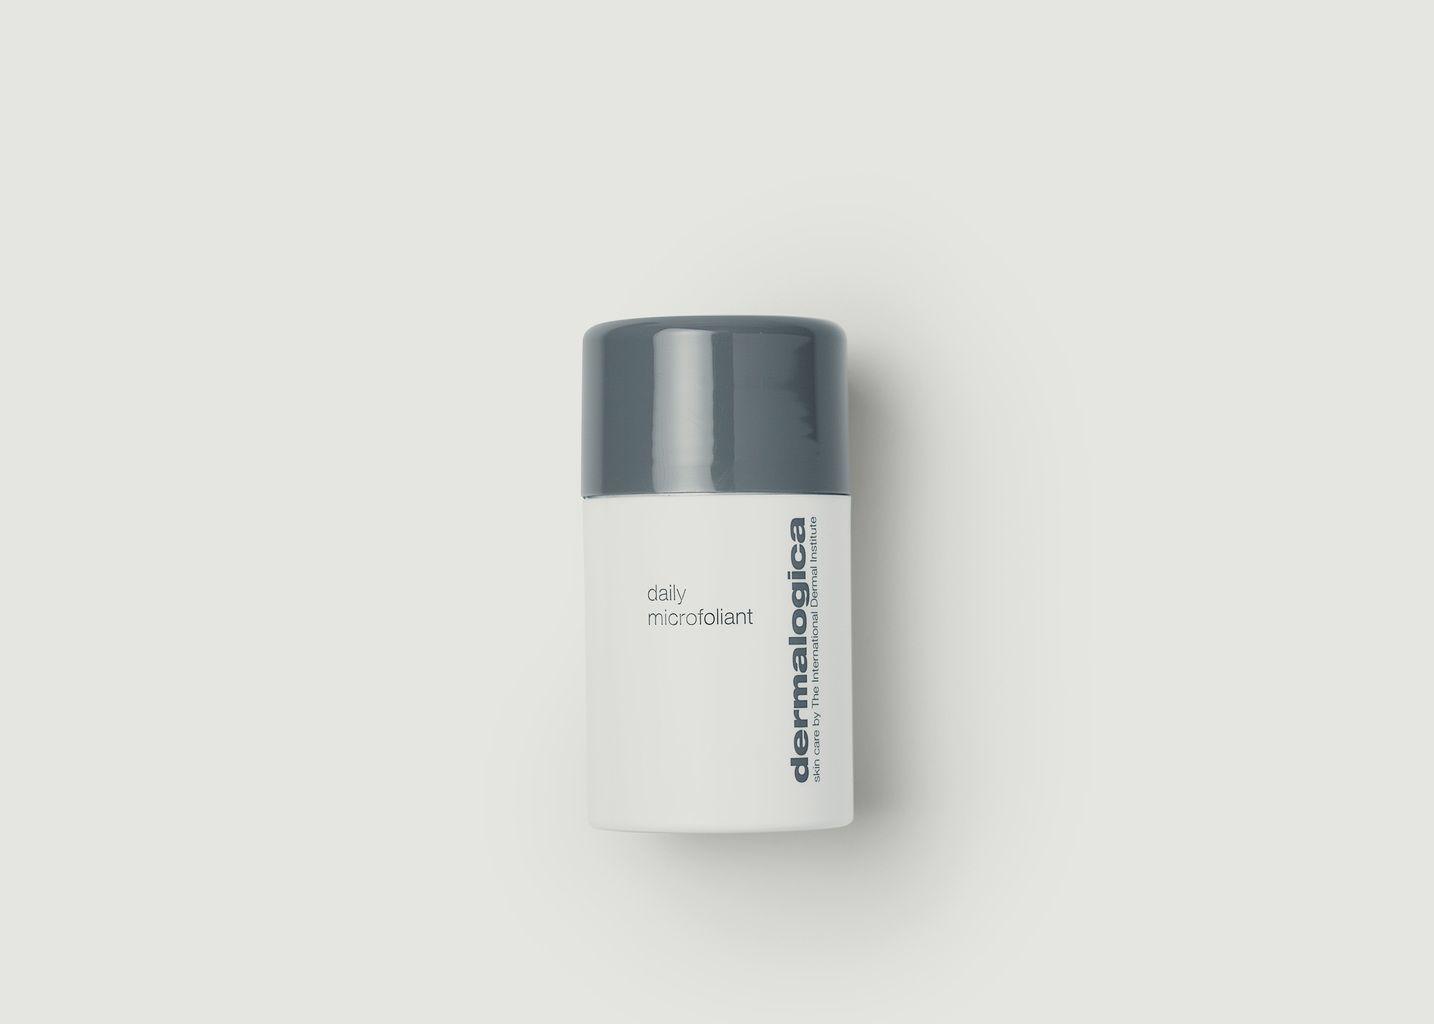 Daily microfoliant 13gr - Dermalogica